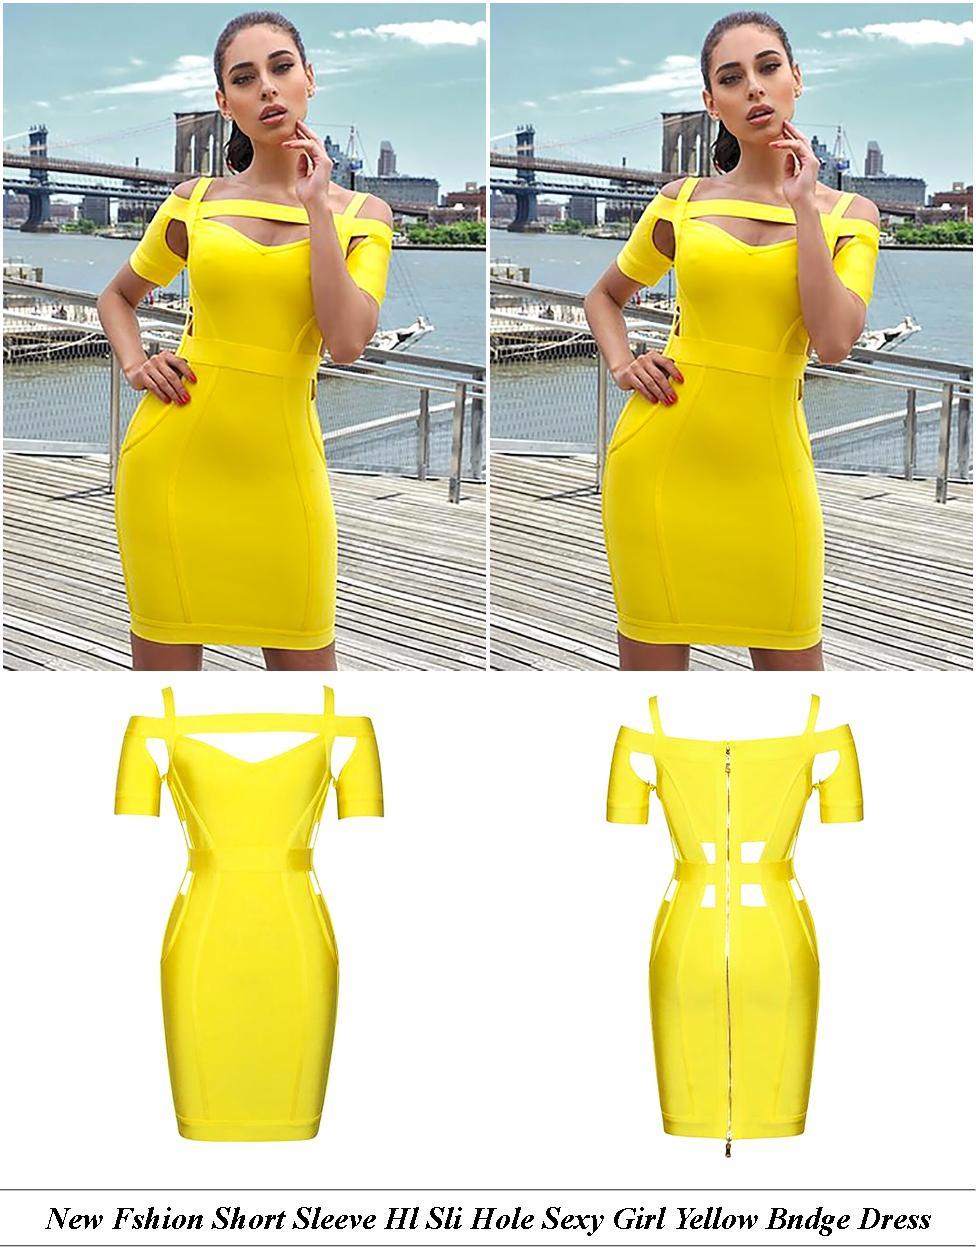 Maxi Dresses For Women - On Sale - Dress Design - Cheap Designer Clothes Womens